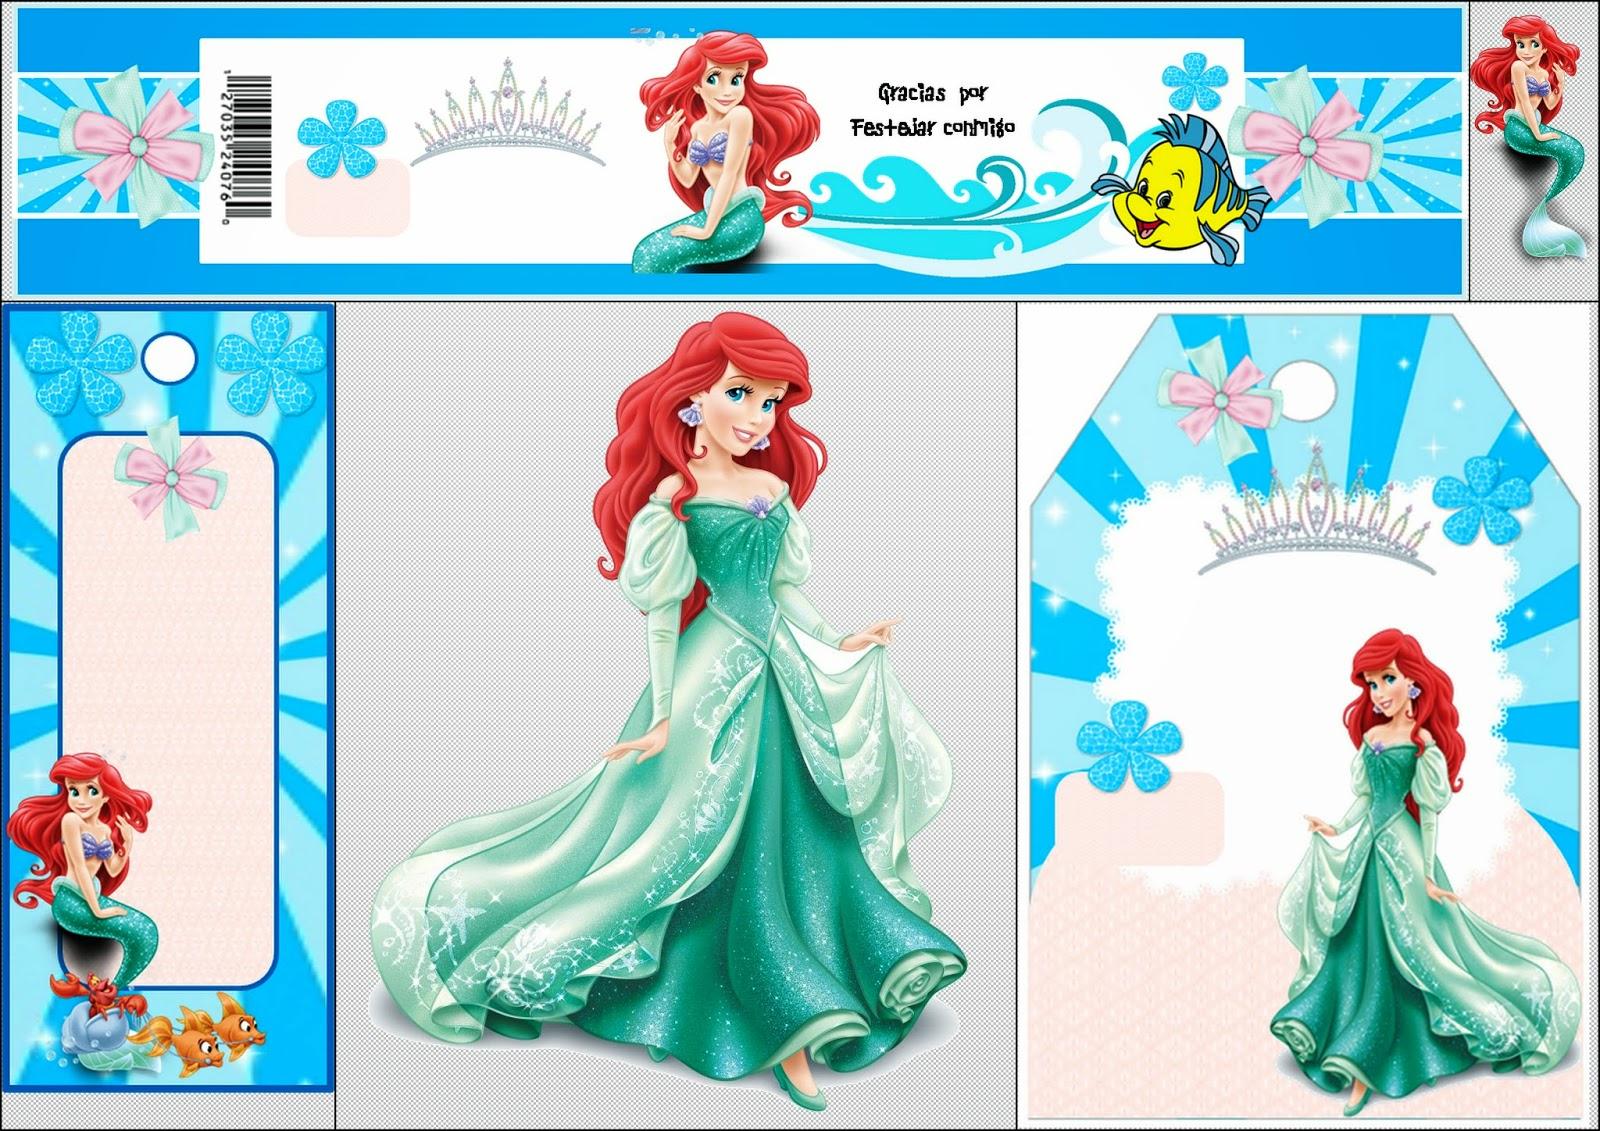 Free Printable Mini Kit For Your Little Mermaid Party. | Oh My - Free Printable Little Mermaid Water Bottle Labels